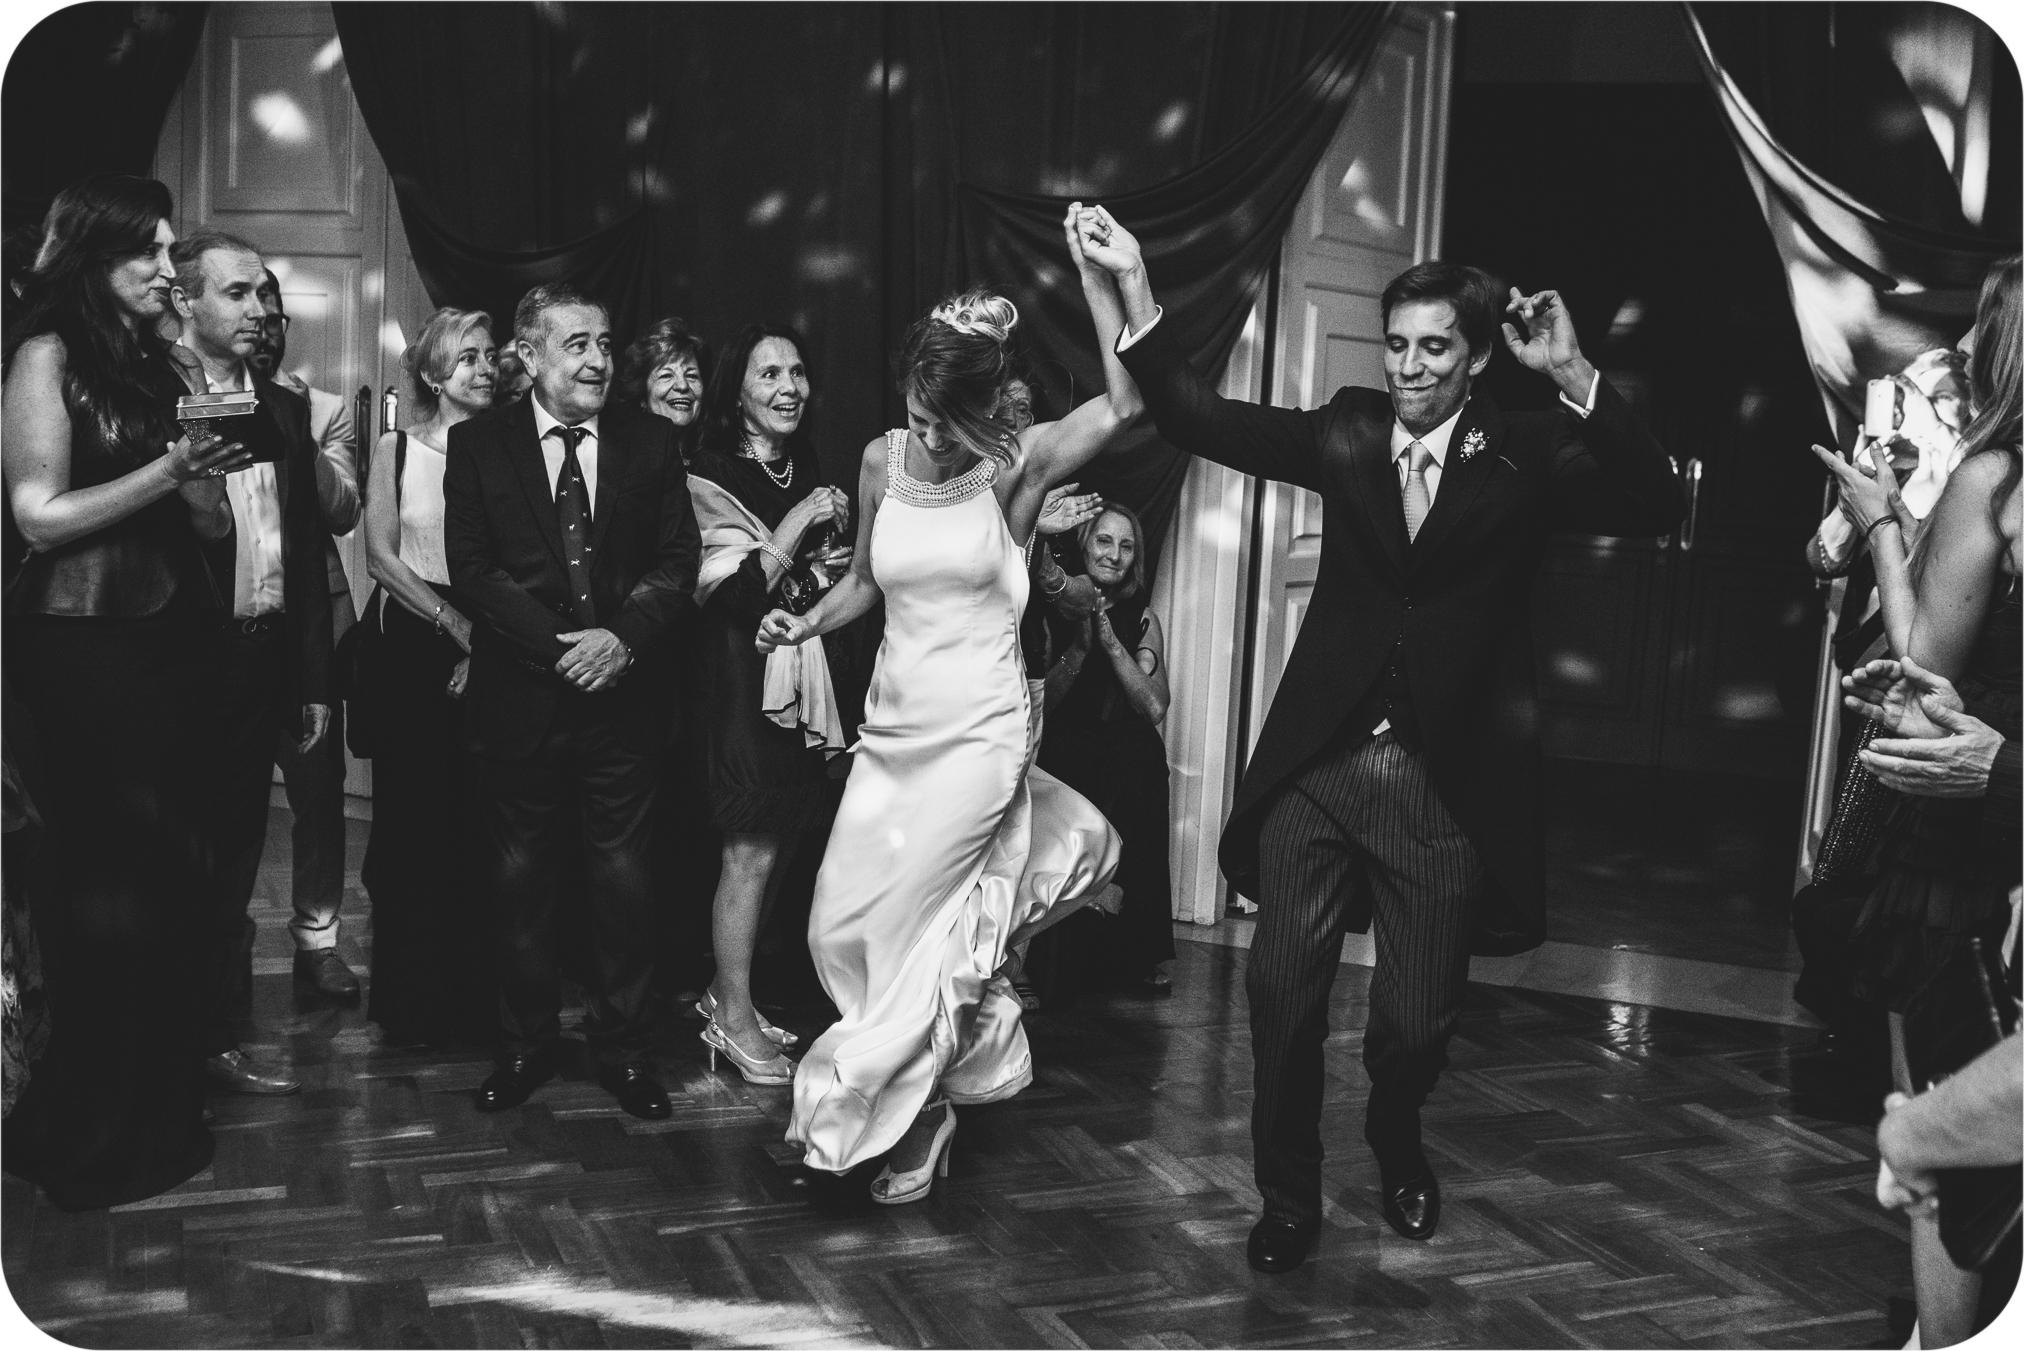 fotografías fiesta boda | Maxi Oviedo